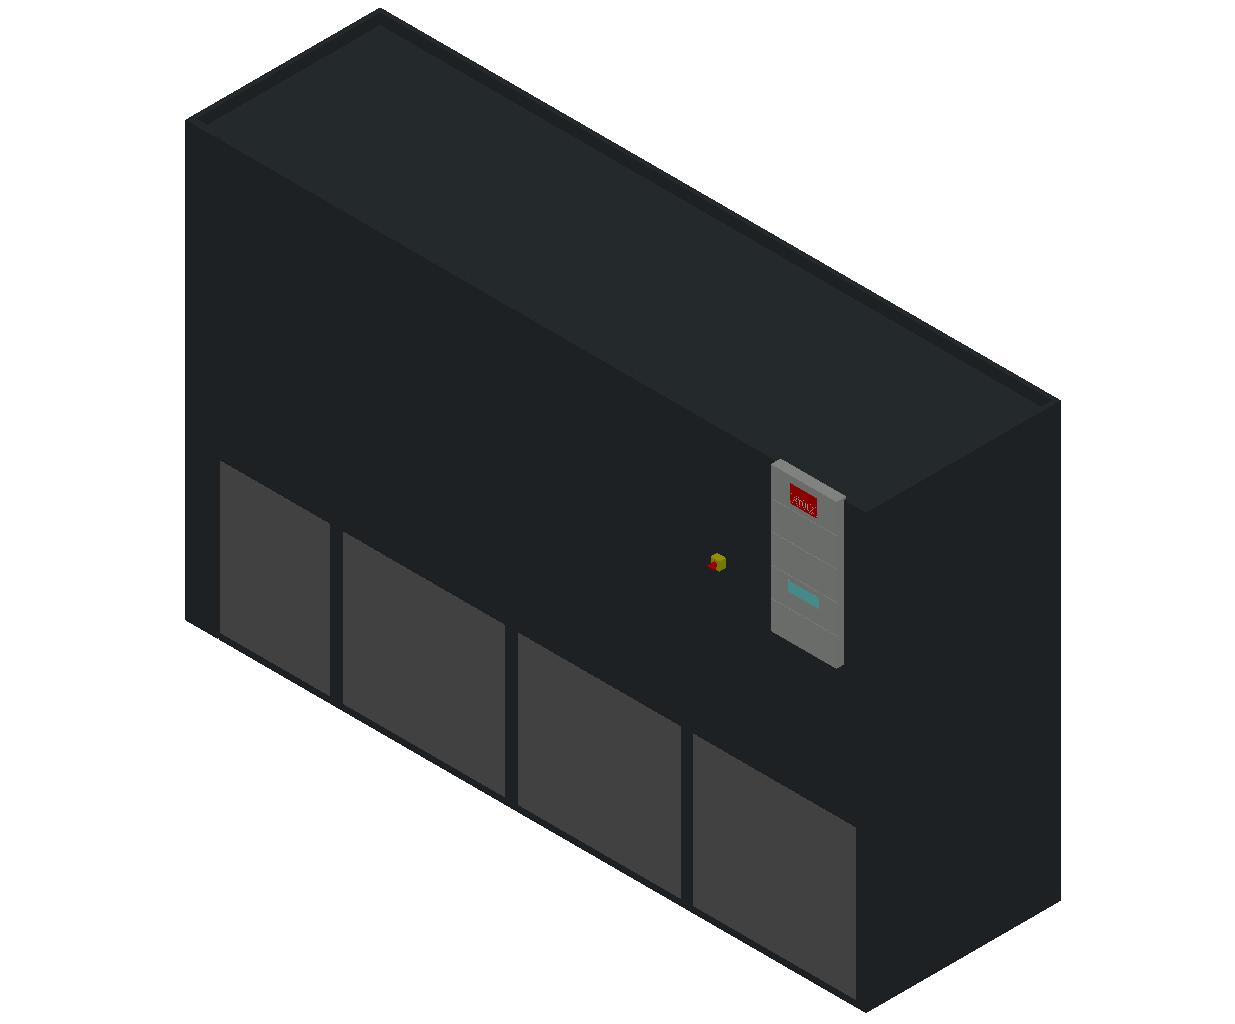 HC_Air Conditioner_Indoor Unit_MEPcontent_STULZ_CyberAir 3PRO_ALU_Dual Circuit GES_ALU_1042_GES_INT-EN.dwg